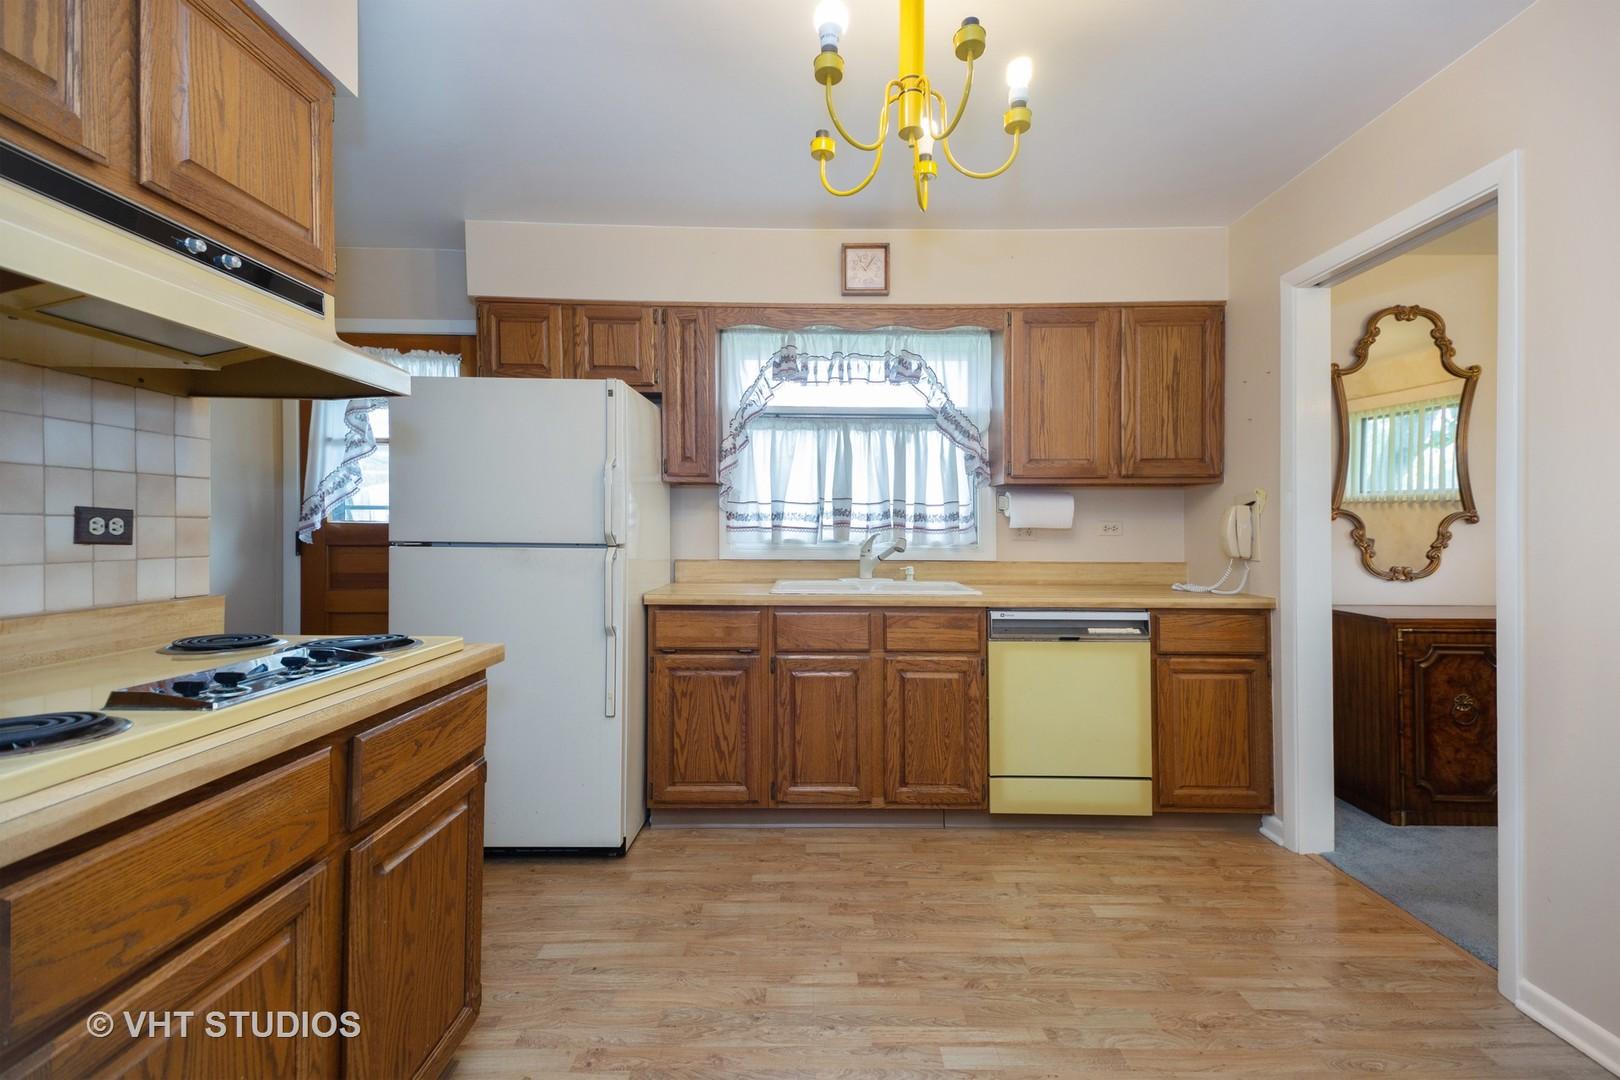 21 CRESCENT, Glenview, Illinois, 60025